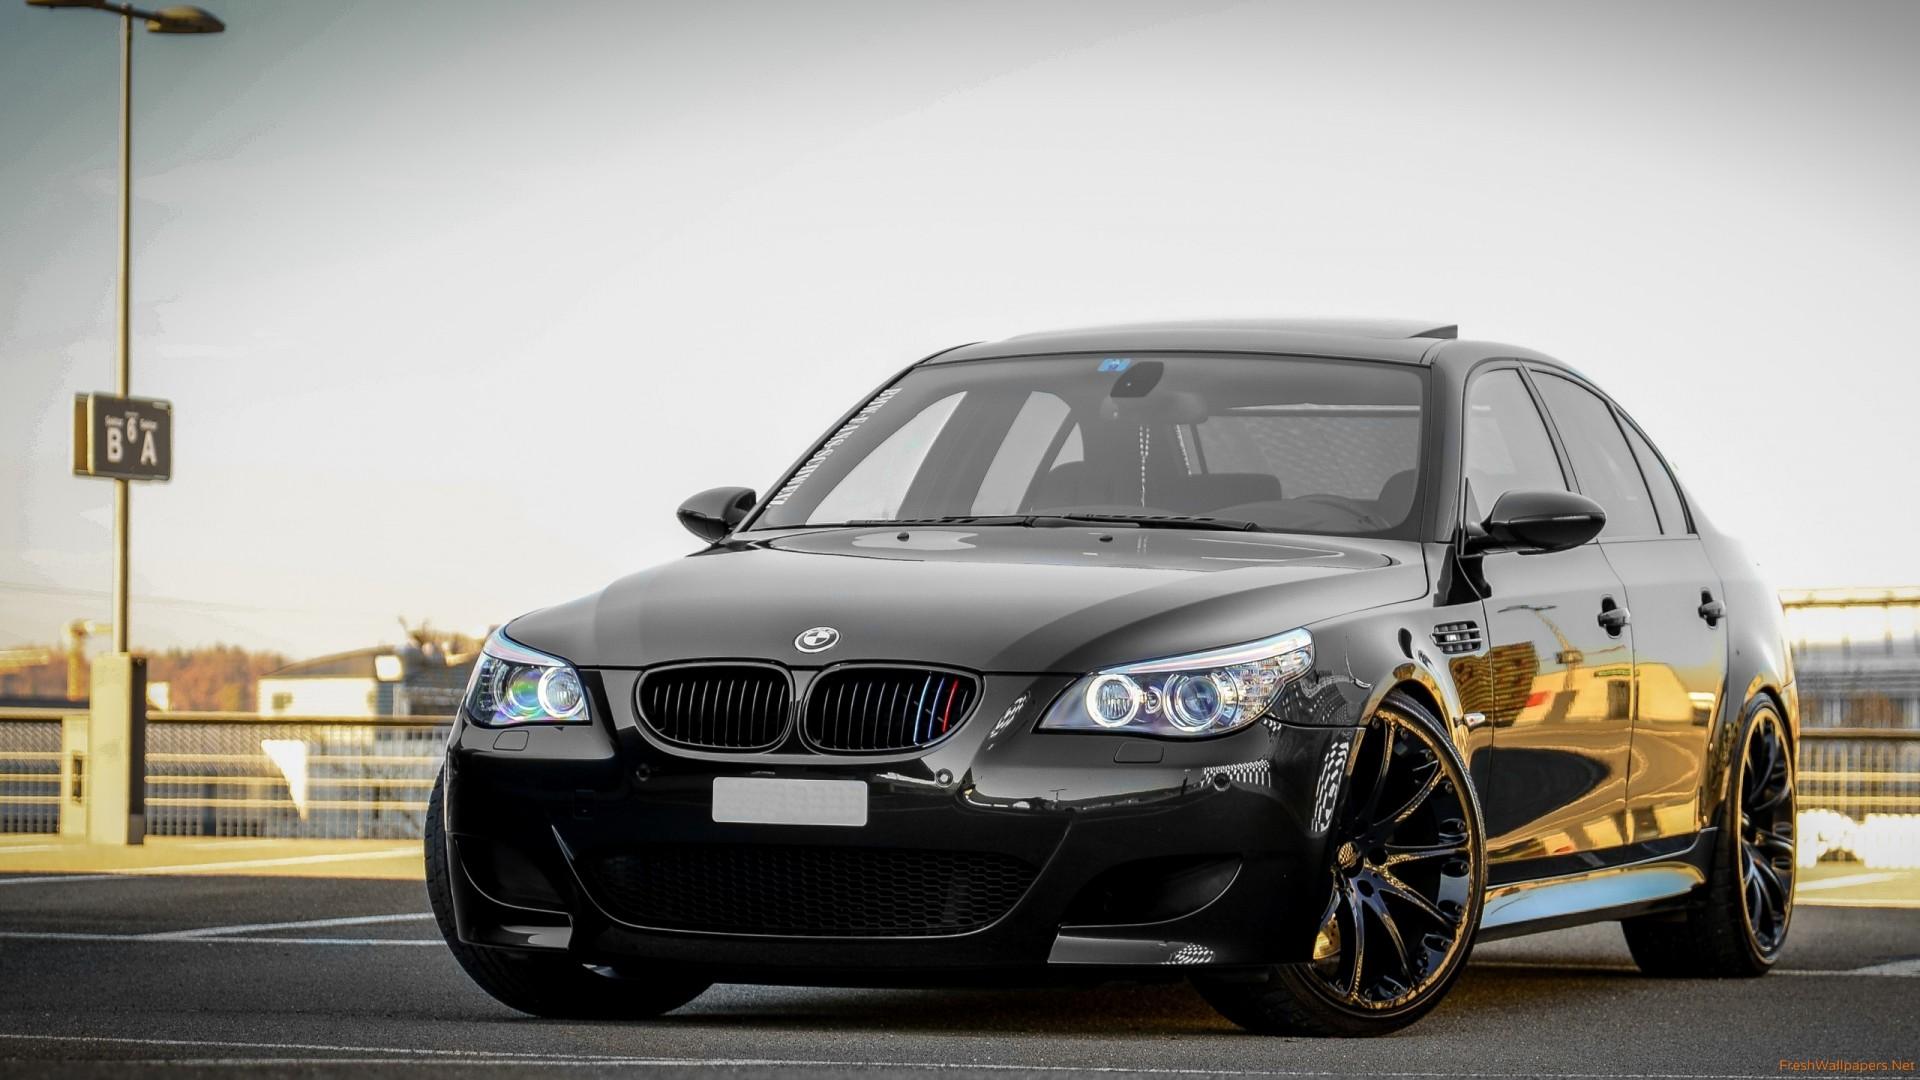 42] BMW E60 M5 Wallpapers on WallpaperSafari 1920x1080